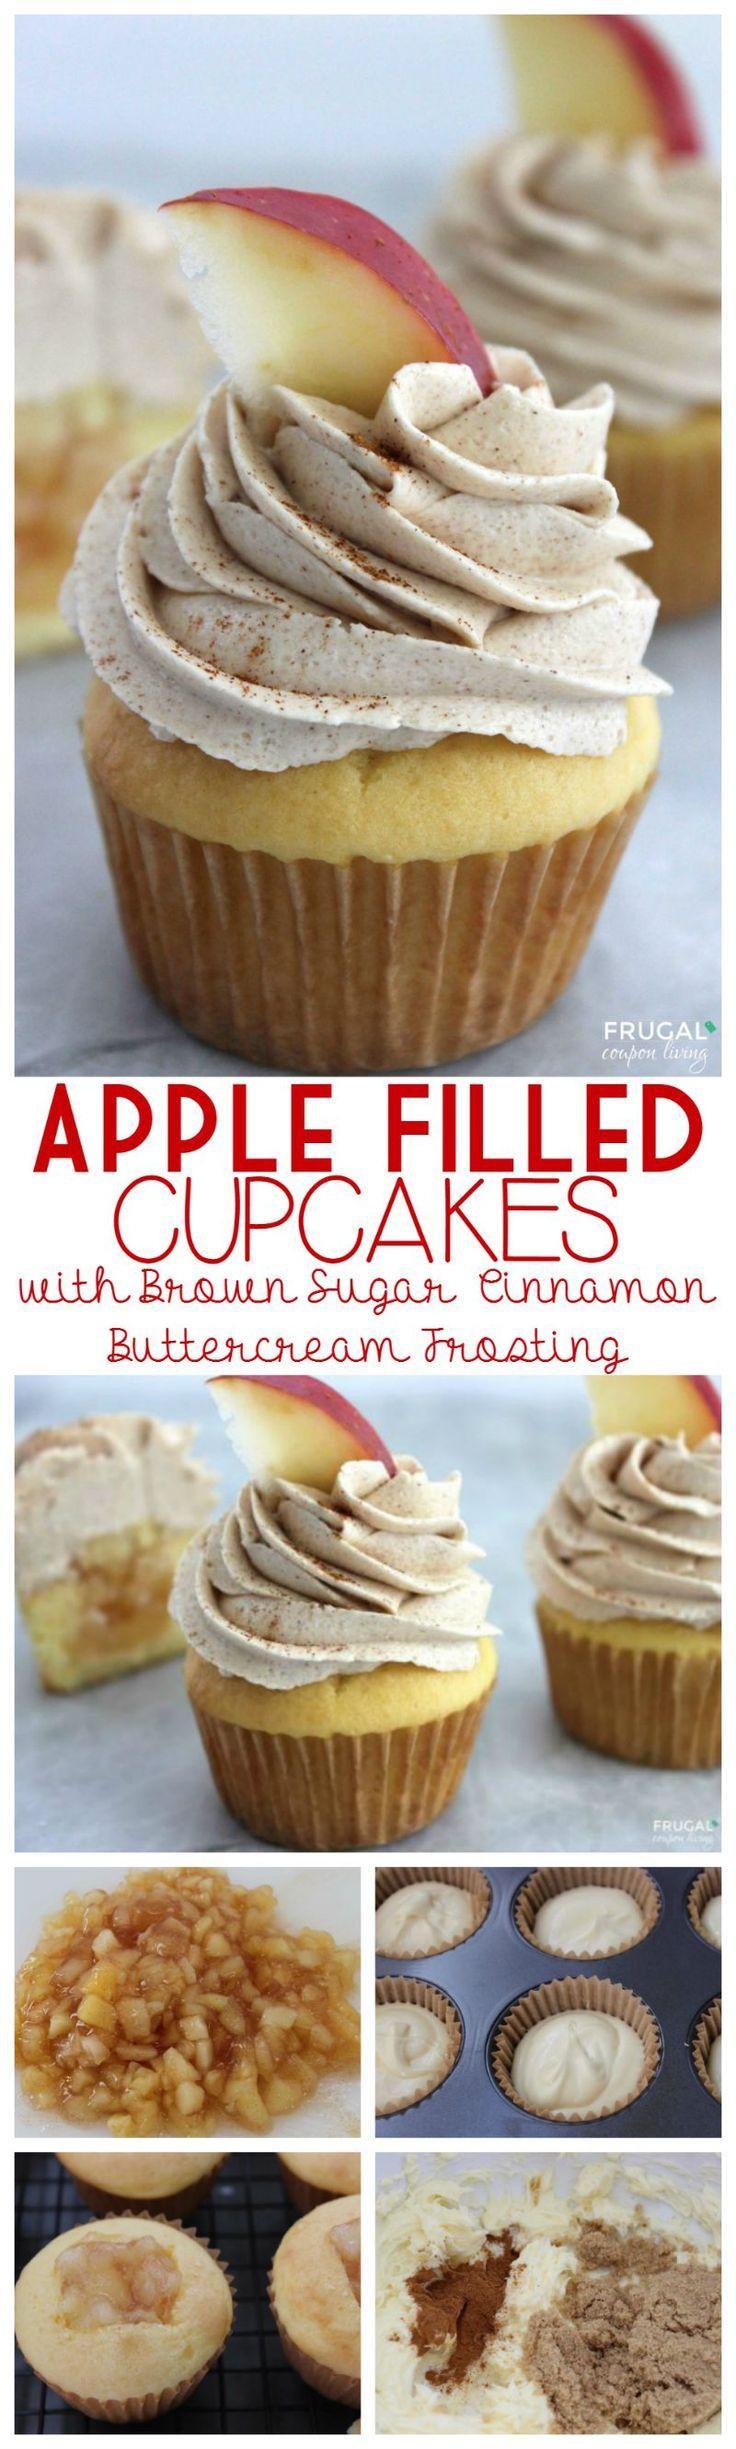 25 Fabulous Autumn Fall Cupcakes  Best 25 Fall Cakes ideas on Pinterest